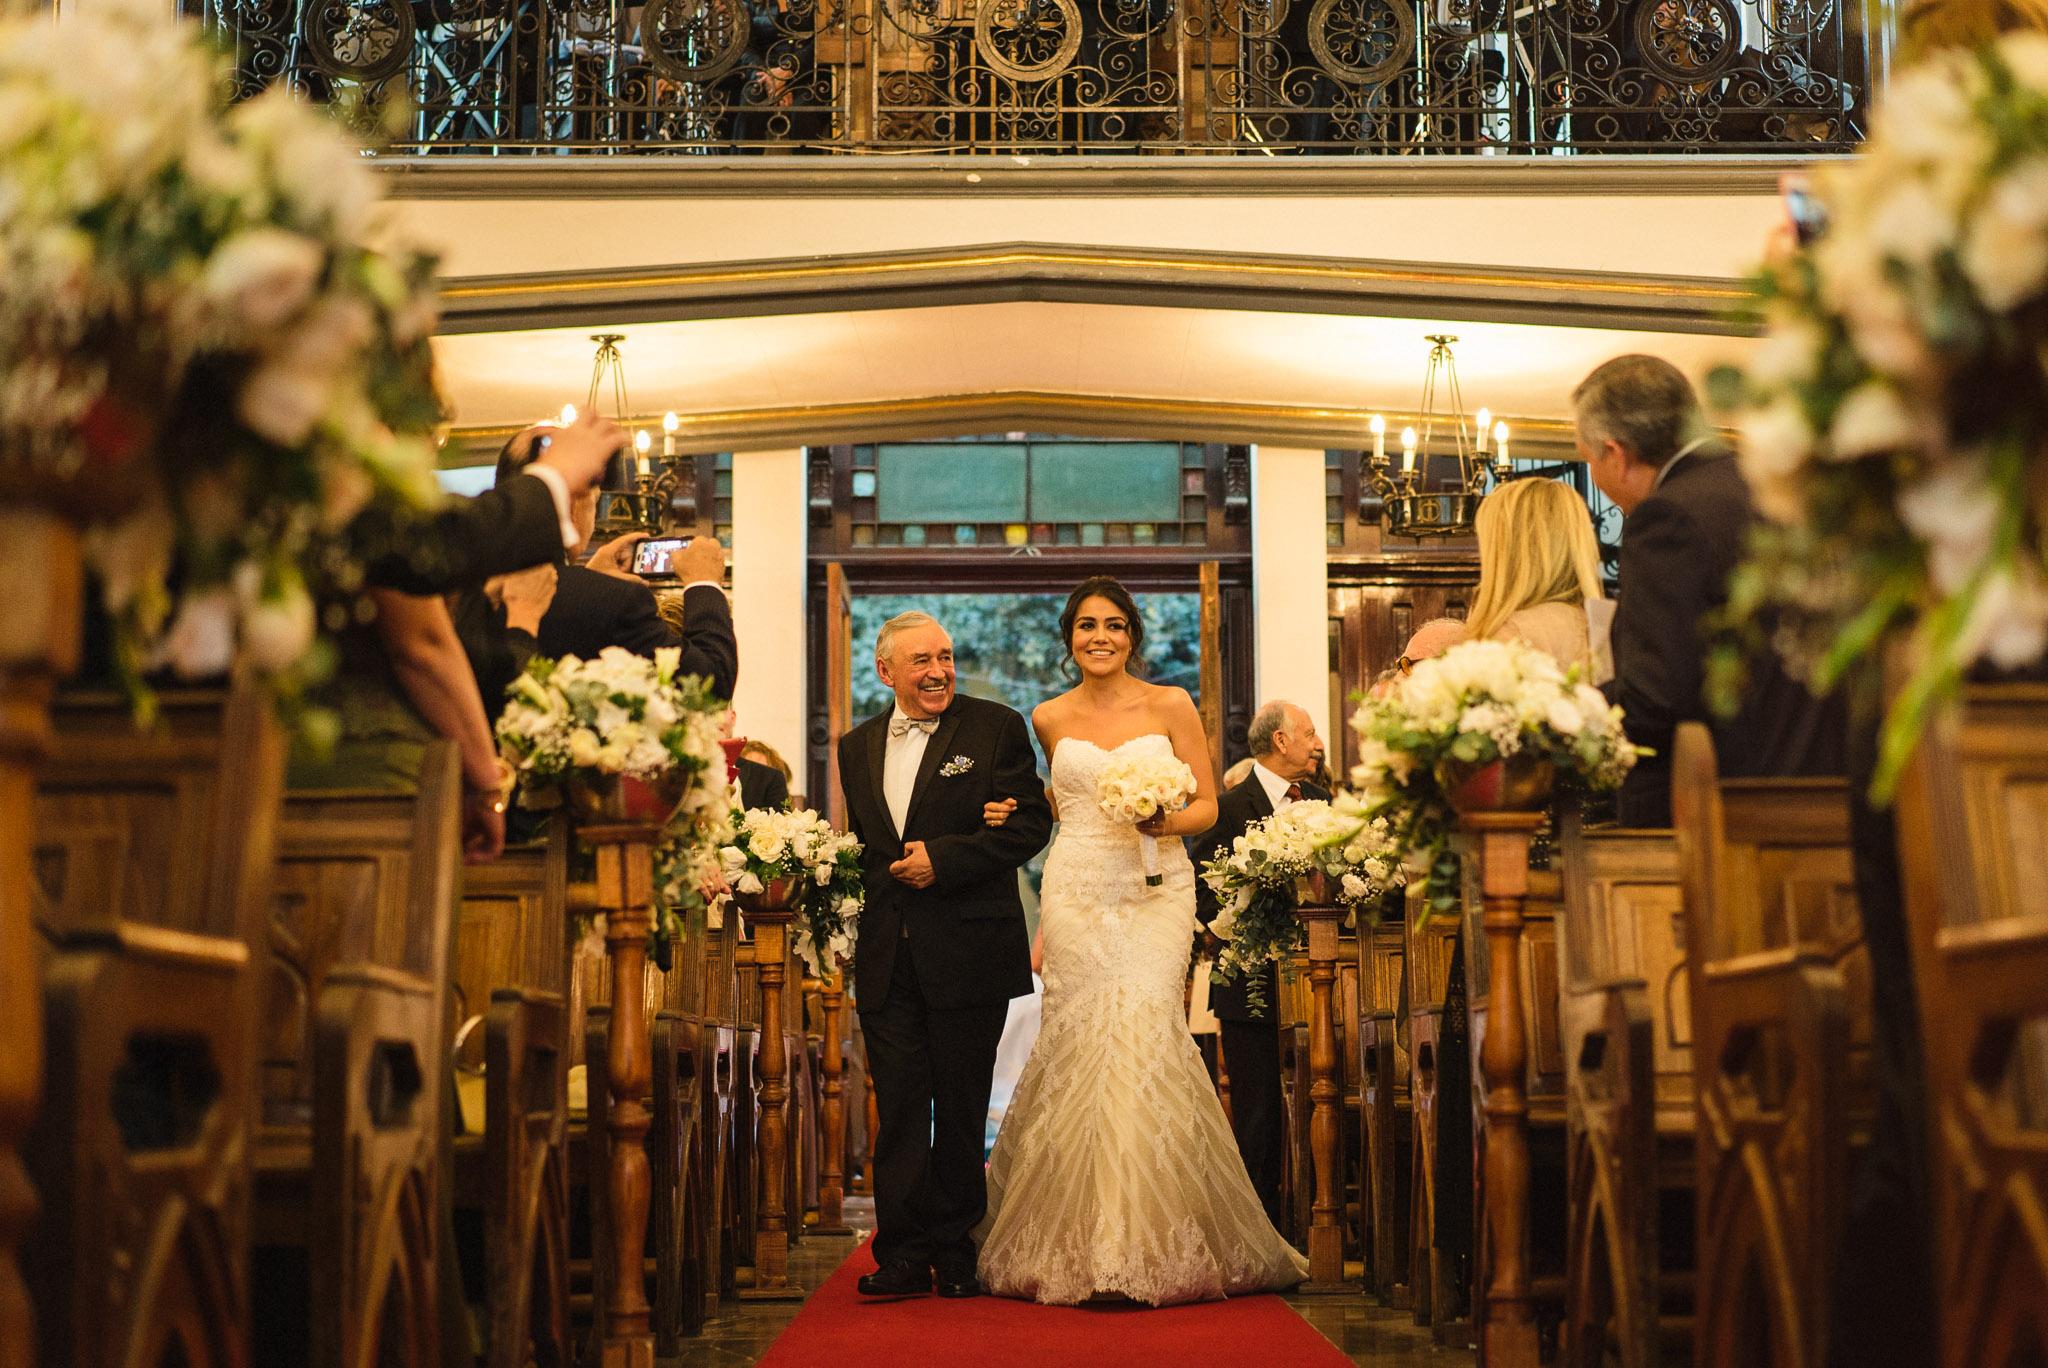 ©www.mauriziosolisbroca.com-20161001maurizio-solis-broca-mexico-canada-wedding-photographer20161001DSC07205-2-Edit.jpg